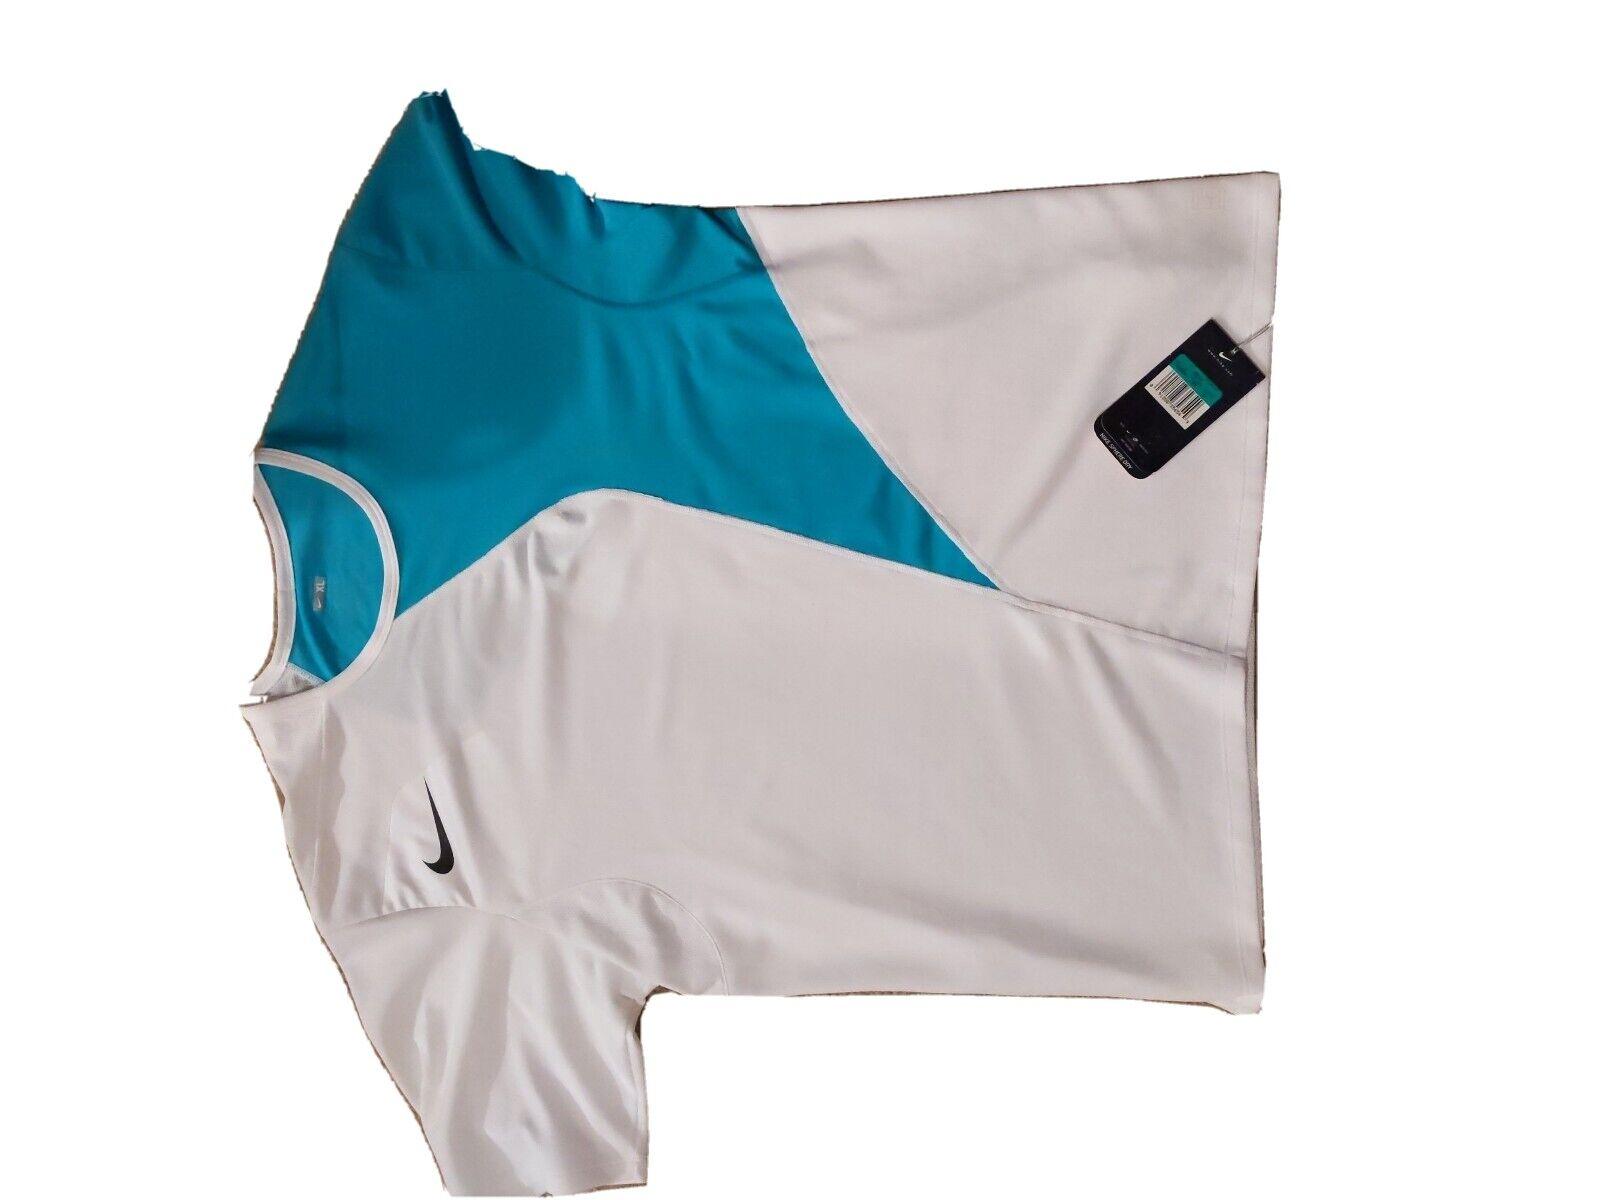 rafael nadal blue shirt